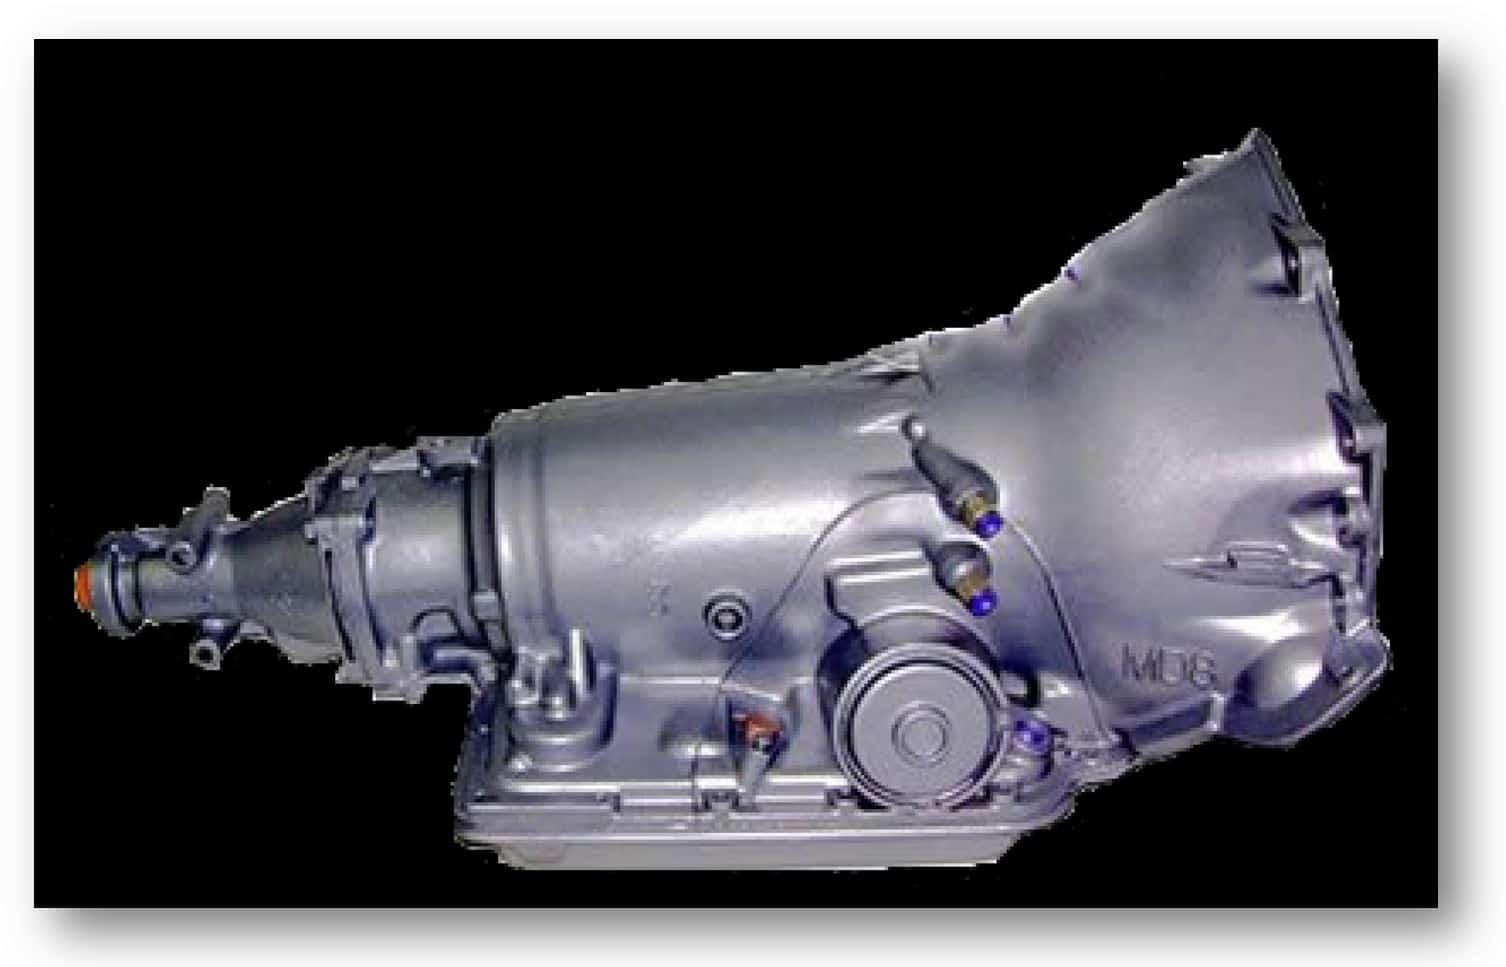 700r4 transmission